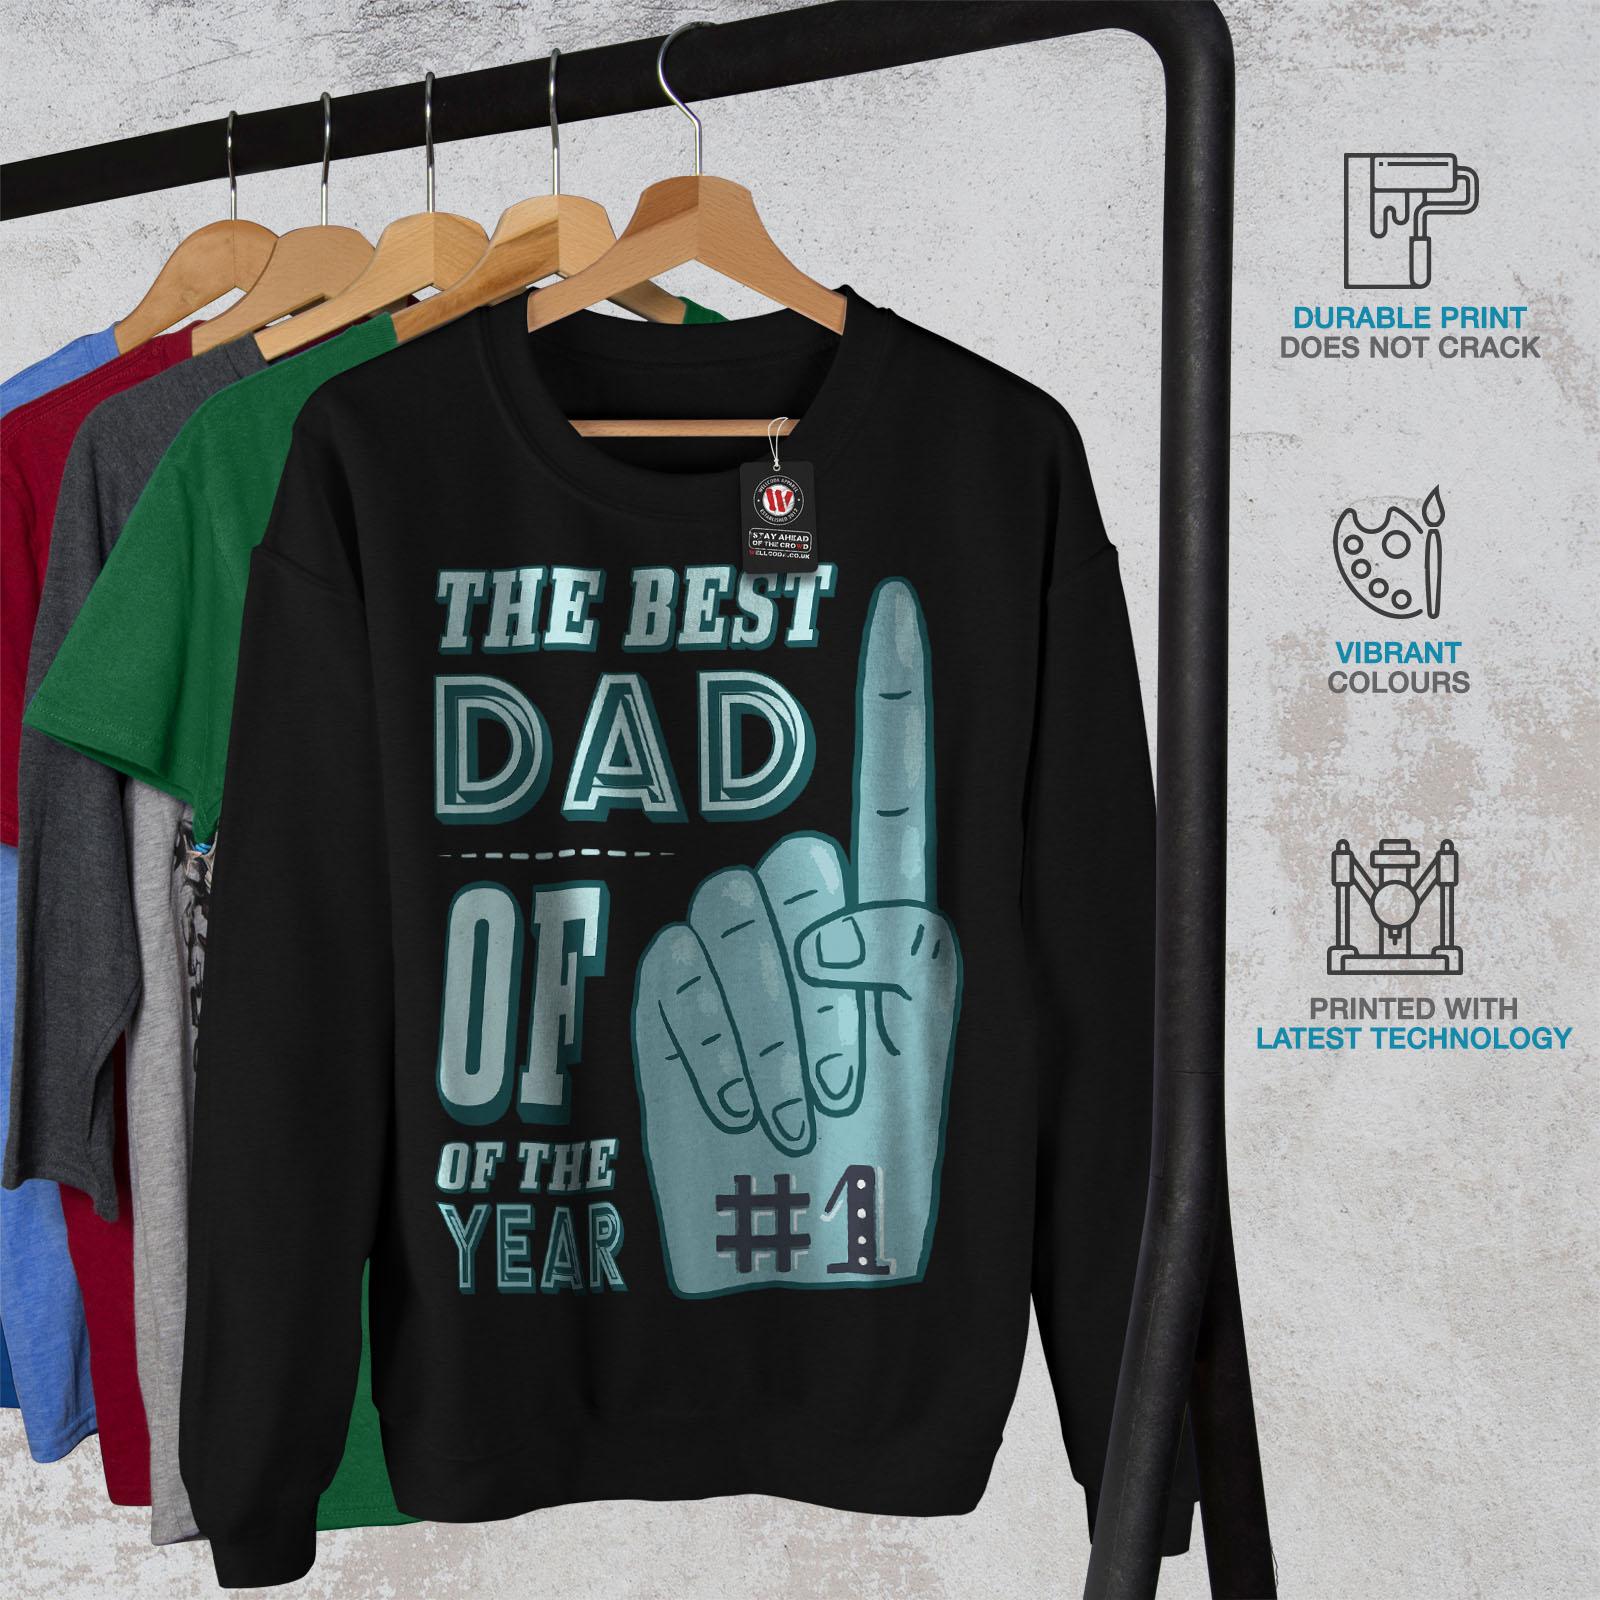 papa Sweatshirt Jumper de Décontracté Meilleur Wellcoda cadeau HommeAnniversaire Noir Pullover 8OPkn0NwXZ